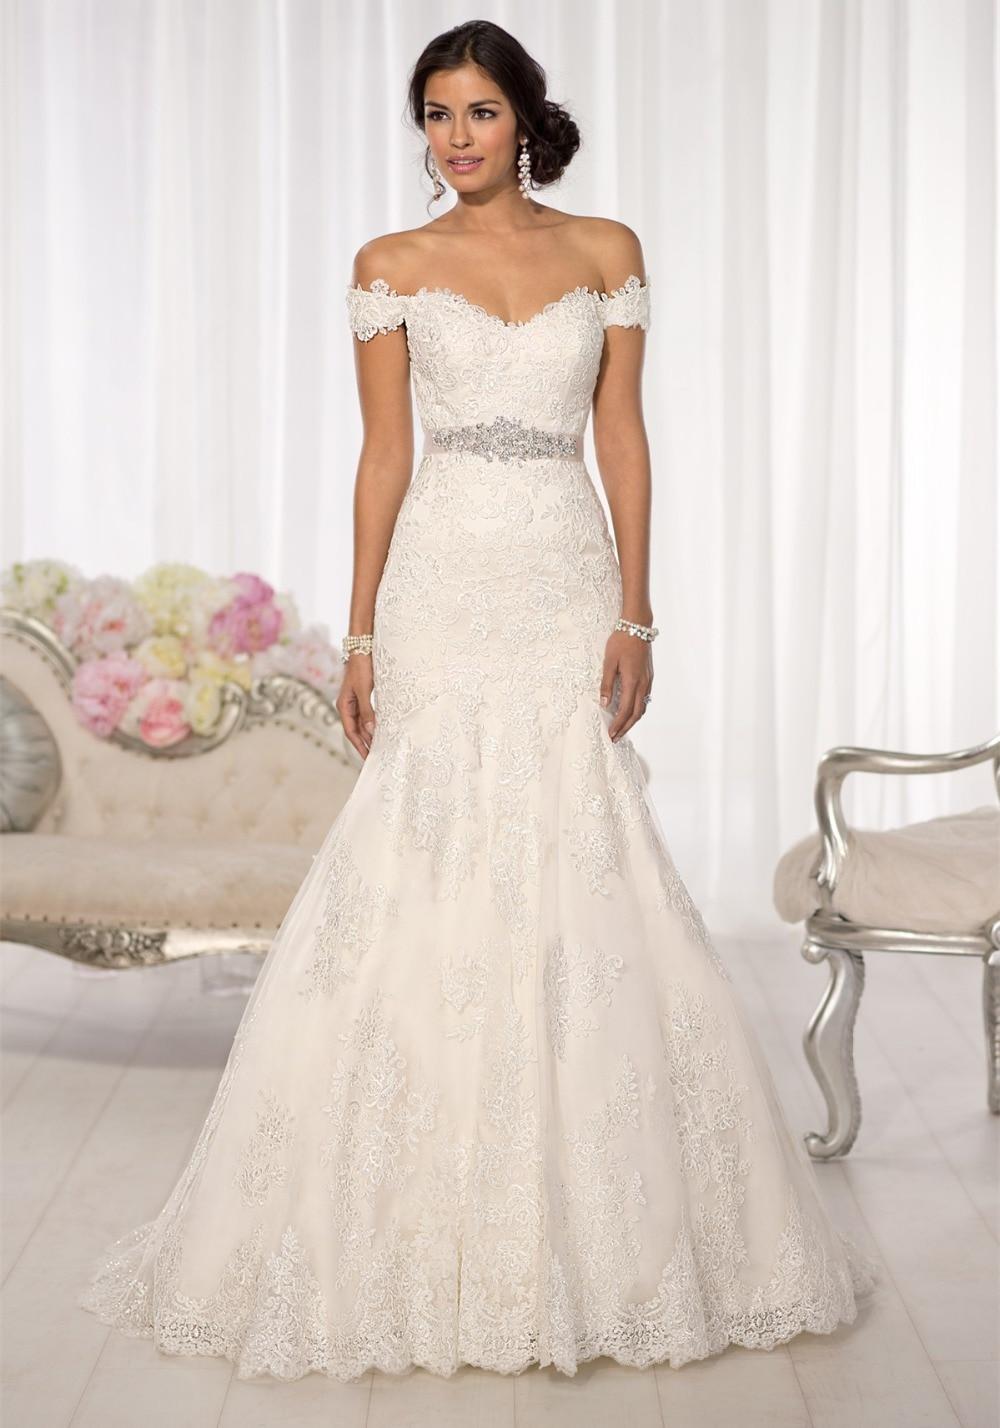 mori lee vintage lace mermaid wedding dress sweetheart lace wedding dress Mori Lee Sweetheart Beaded Mermaid Bridal Dress